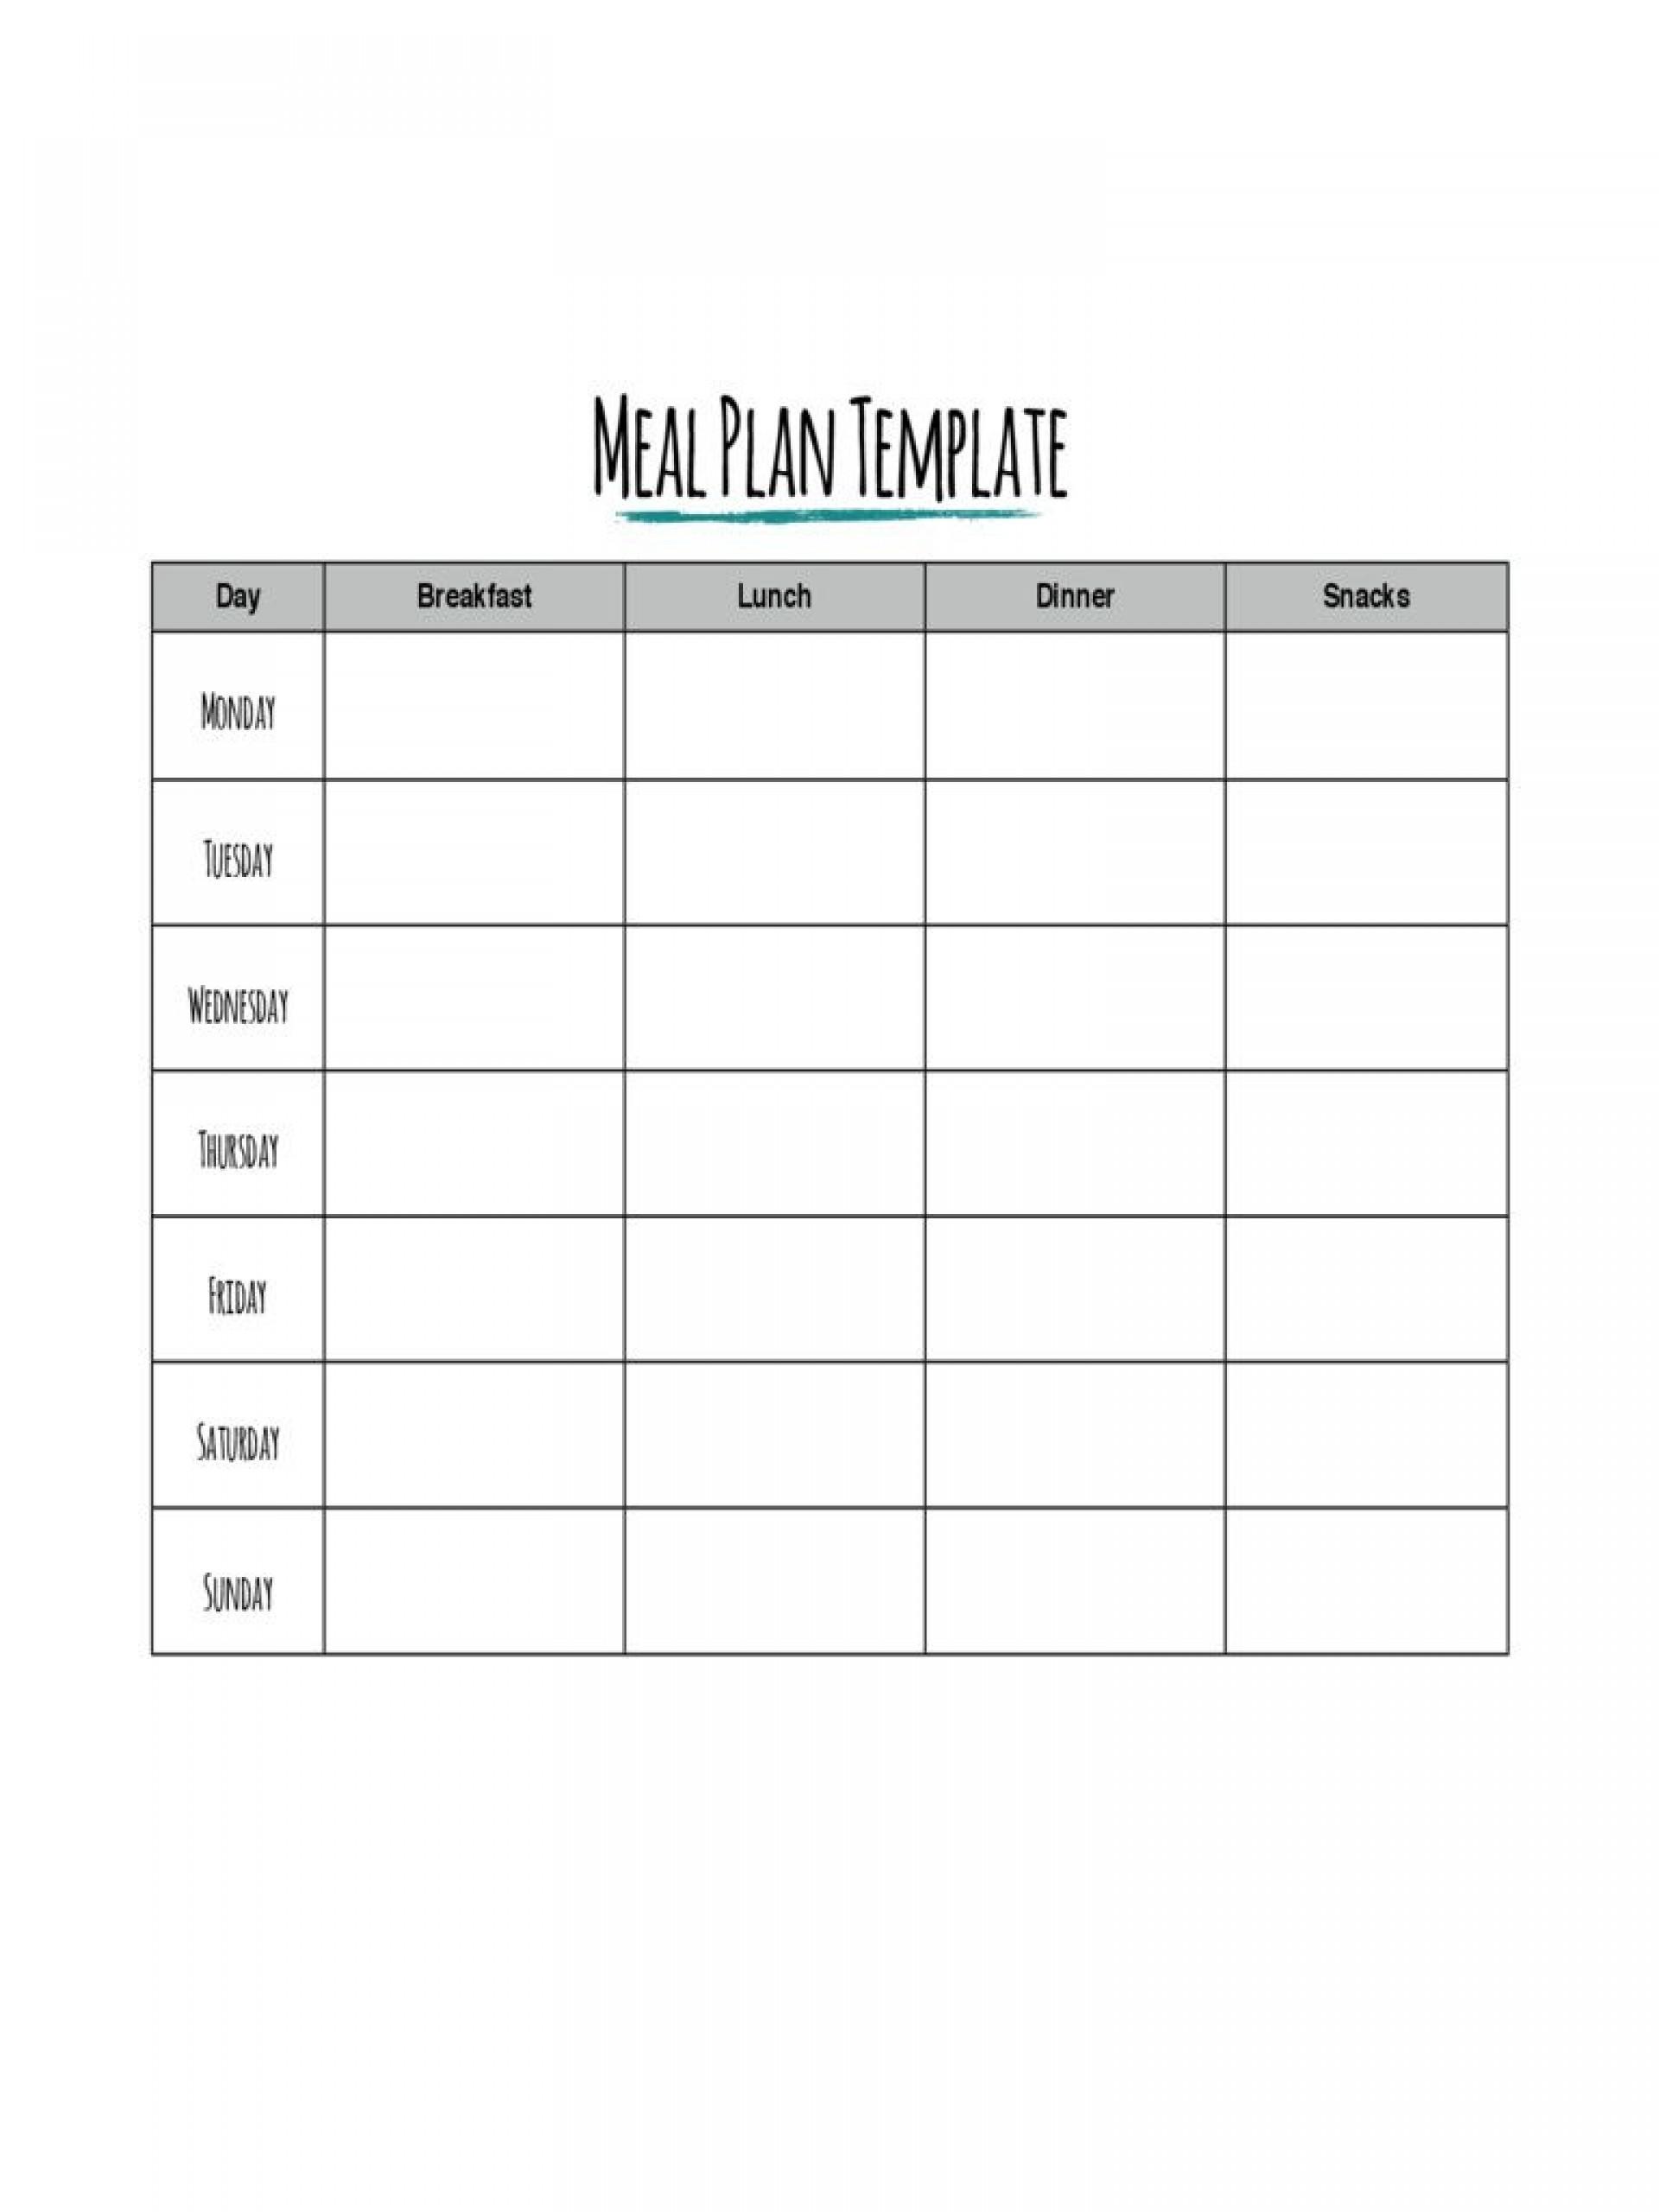 002 Impressive Meal Plan Printable Pdf High Def  Worksheet Downloadable Template Sheet1920